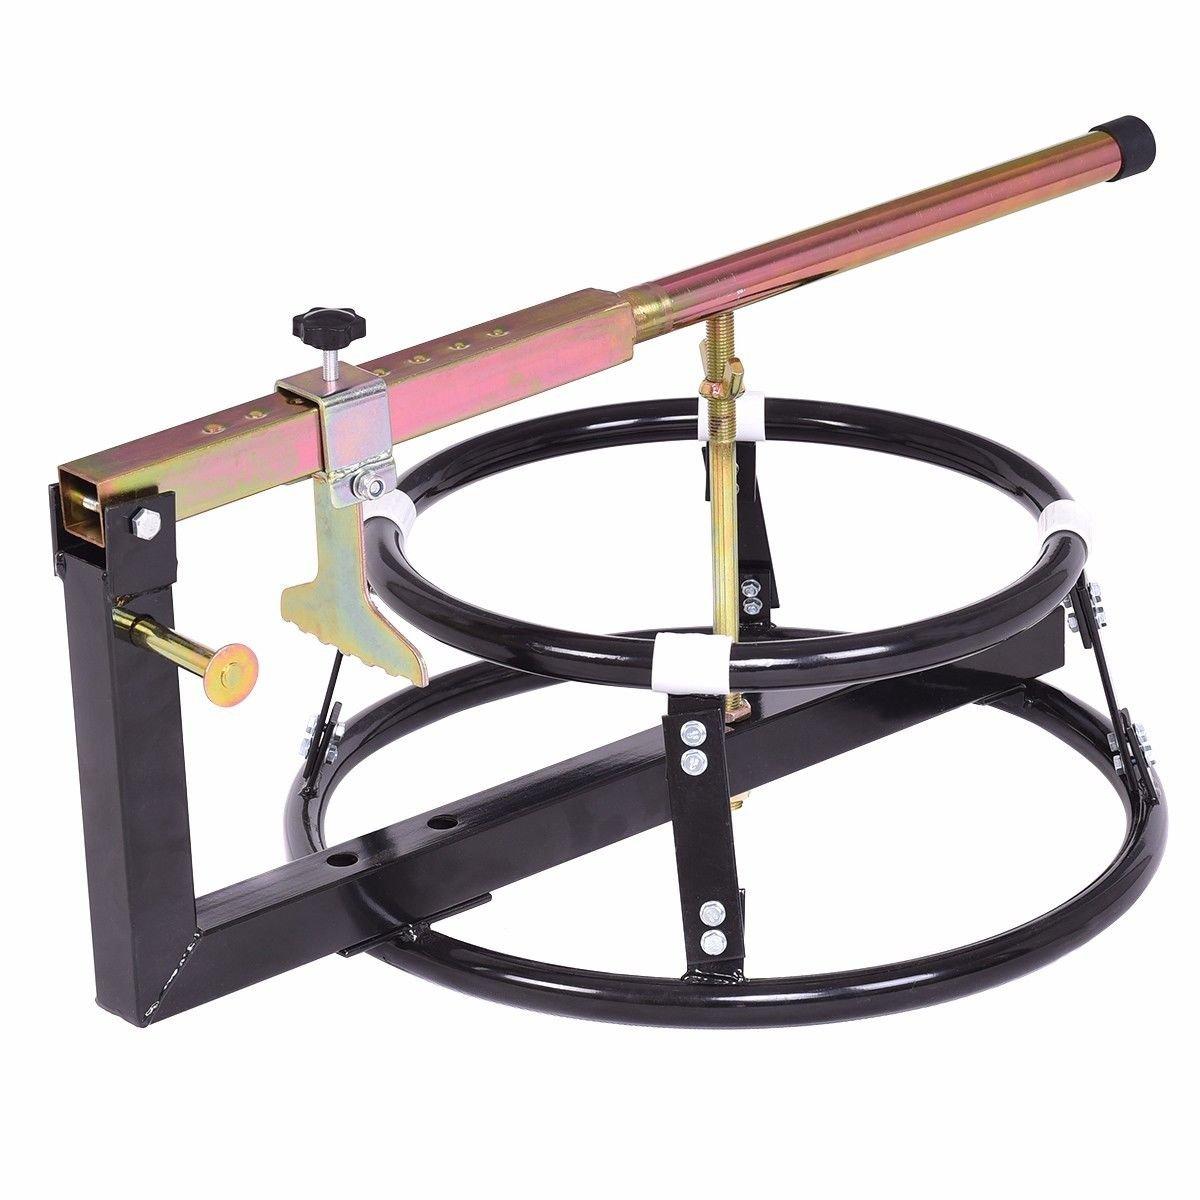 Black Iron Portable Motorcycle Bike Tire Changer fir 16'' Wheels Tires